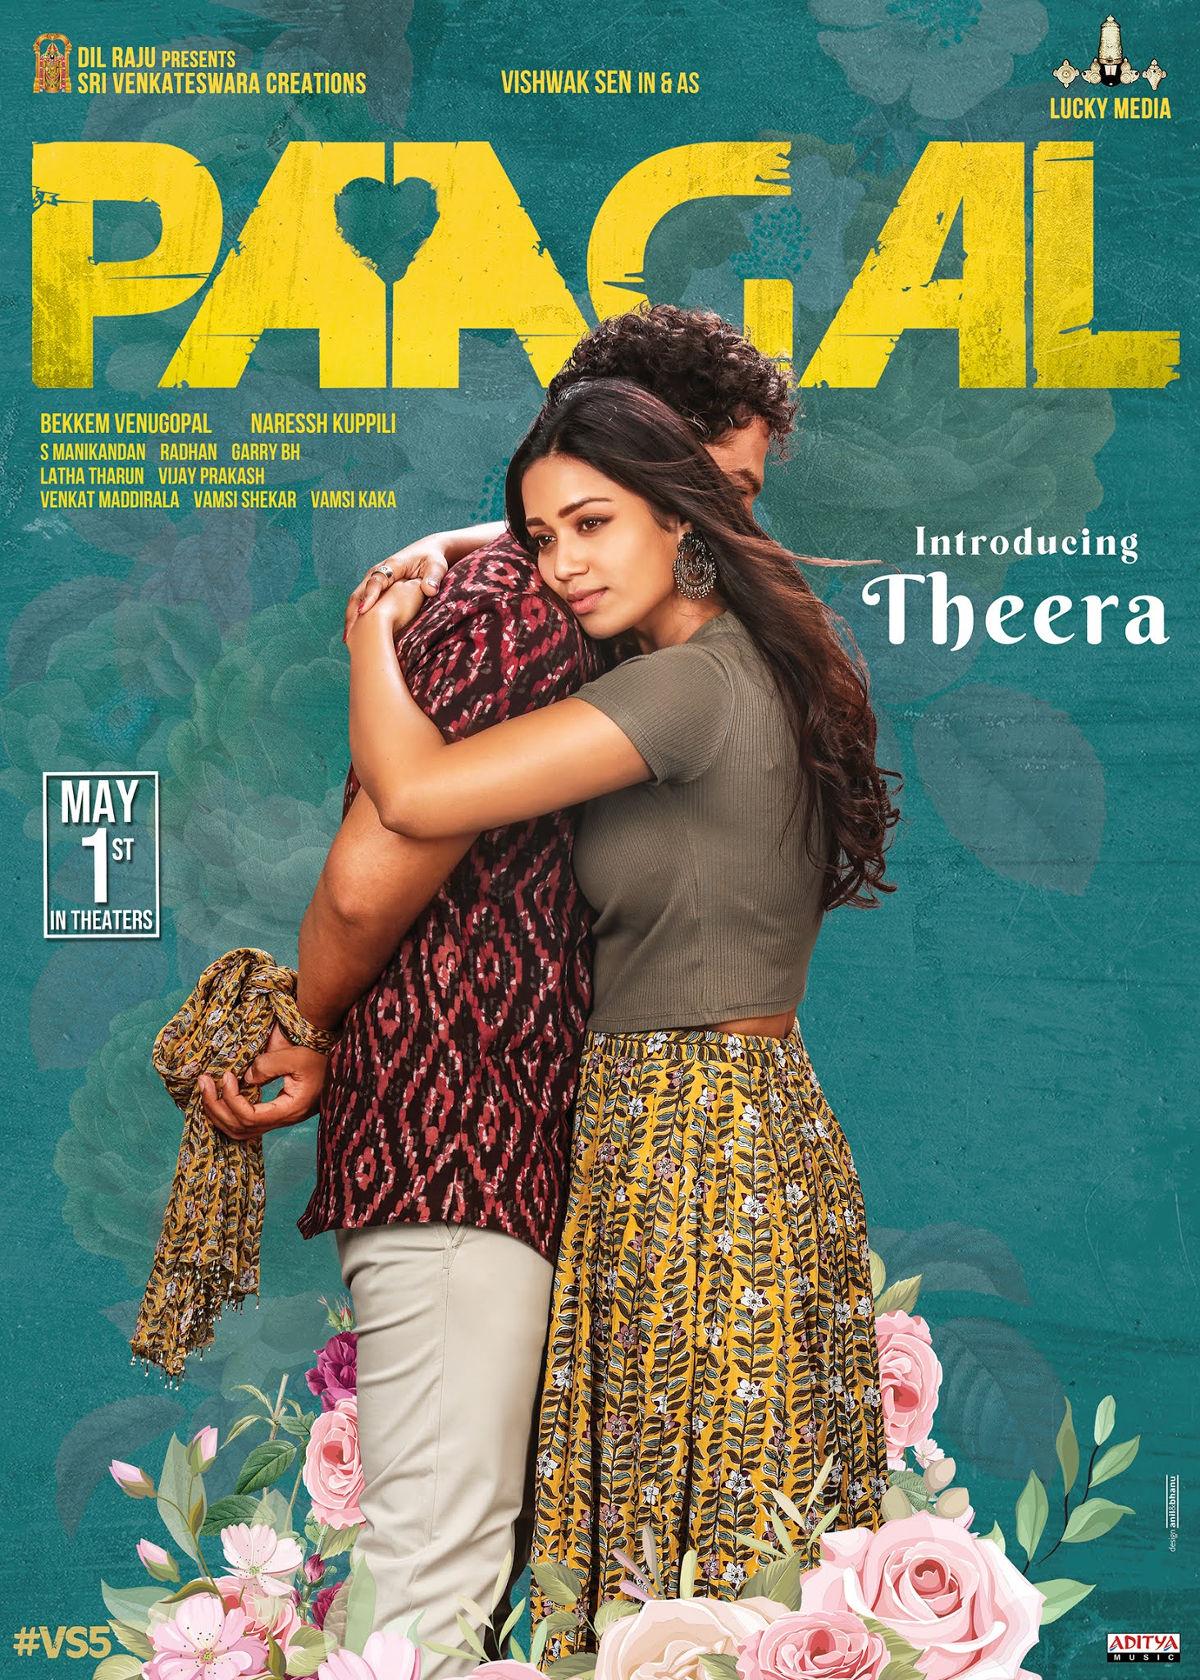 Introducing Nivetha Pethuraj As Theera In Vishwak Sen Paagal Movie Poster